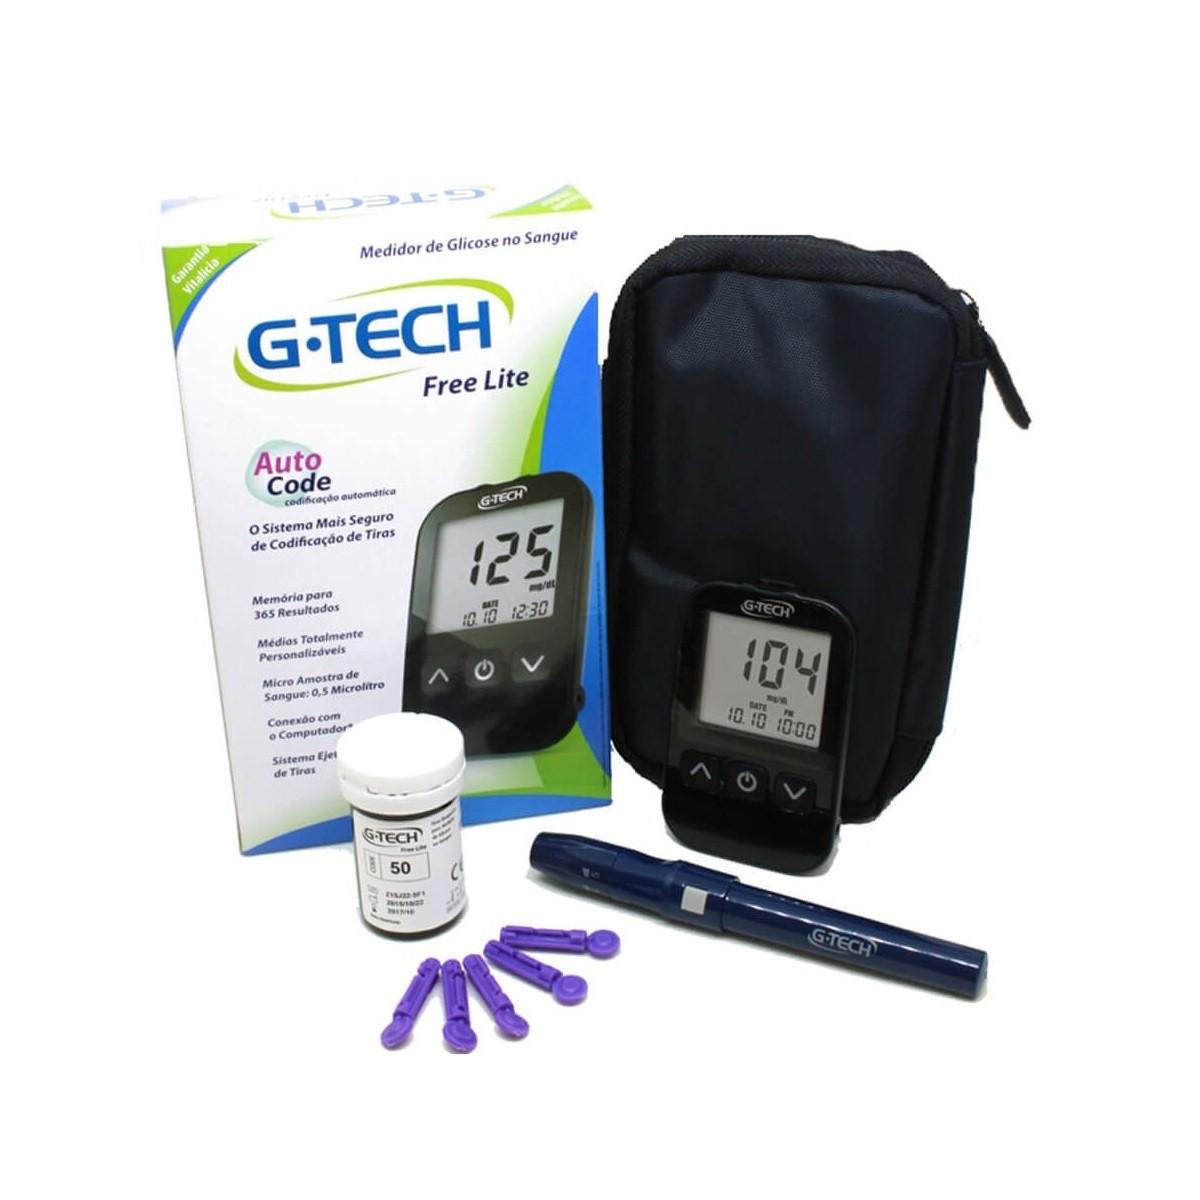 Kit Monitor Glicose Medir Glicemia 100 Tiras 100 Lanc G-tech